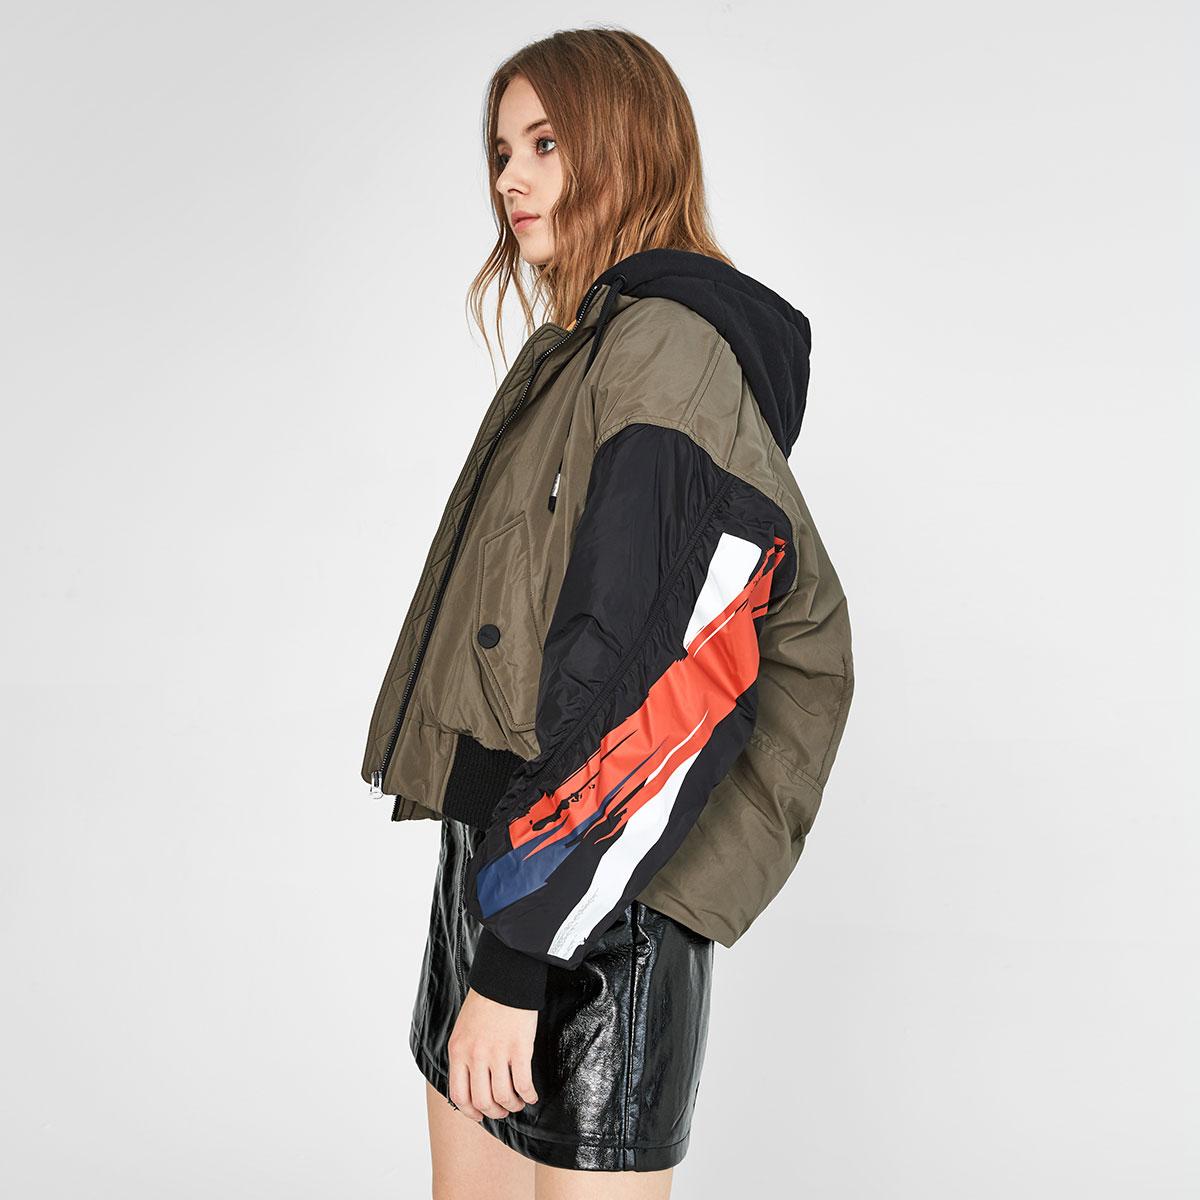 LINC金羽杰冬季新款时尚连帽个性单臂涂鸦夹克短款羽绒服女